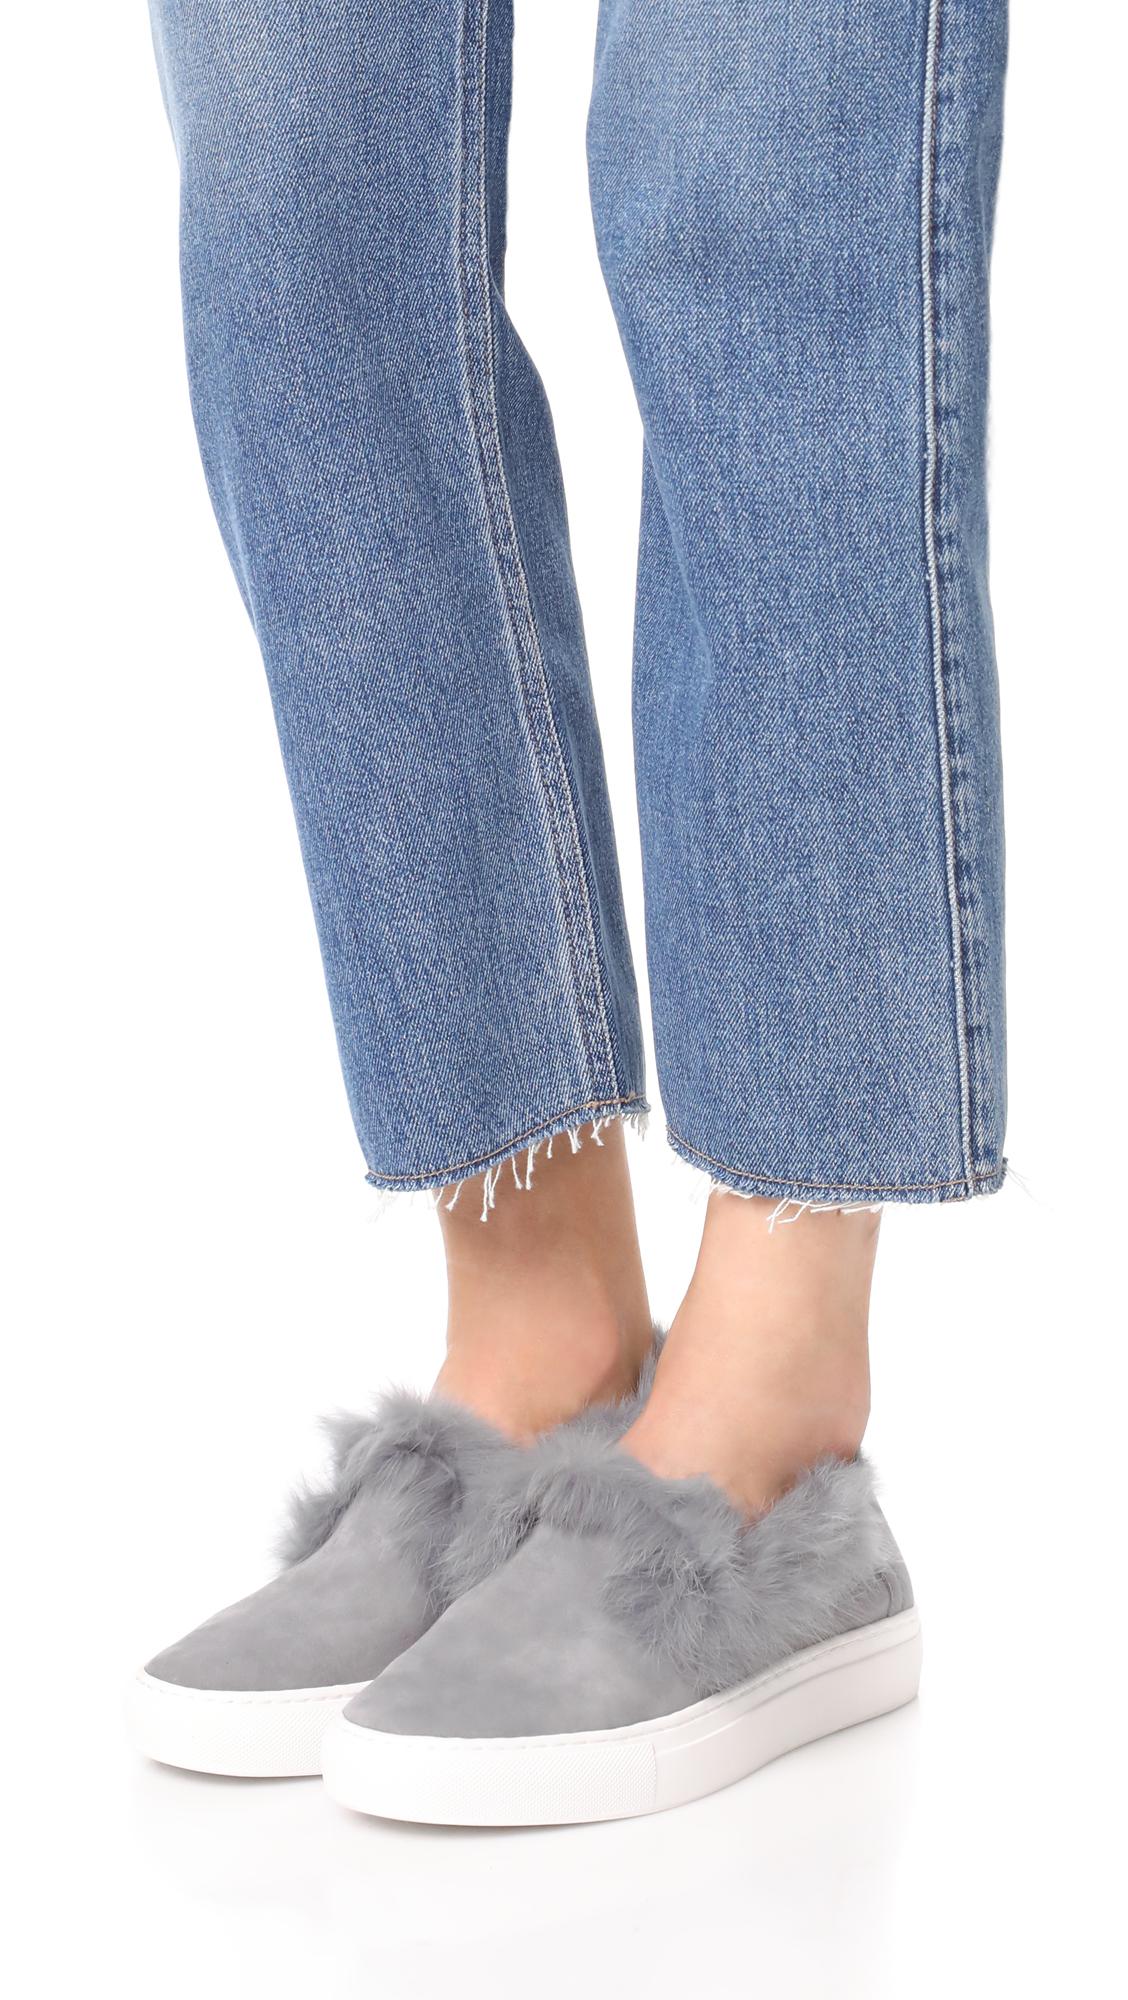 Rachel Zoe Burke Genuine Rabbit Fur Leather Slip-On Sneaker gtvOS7SSk